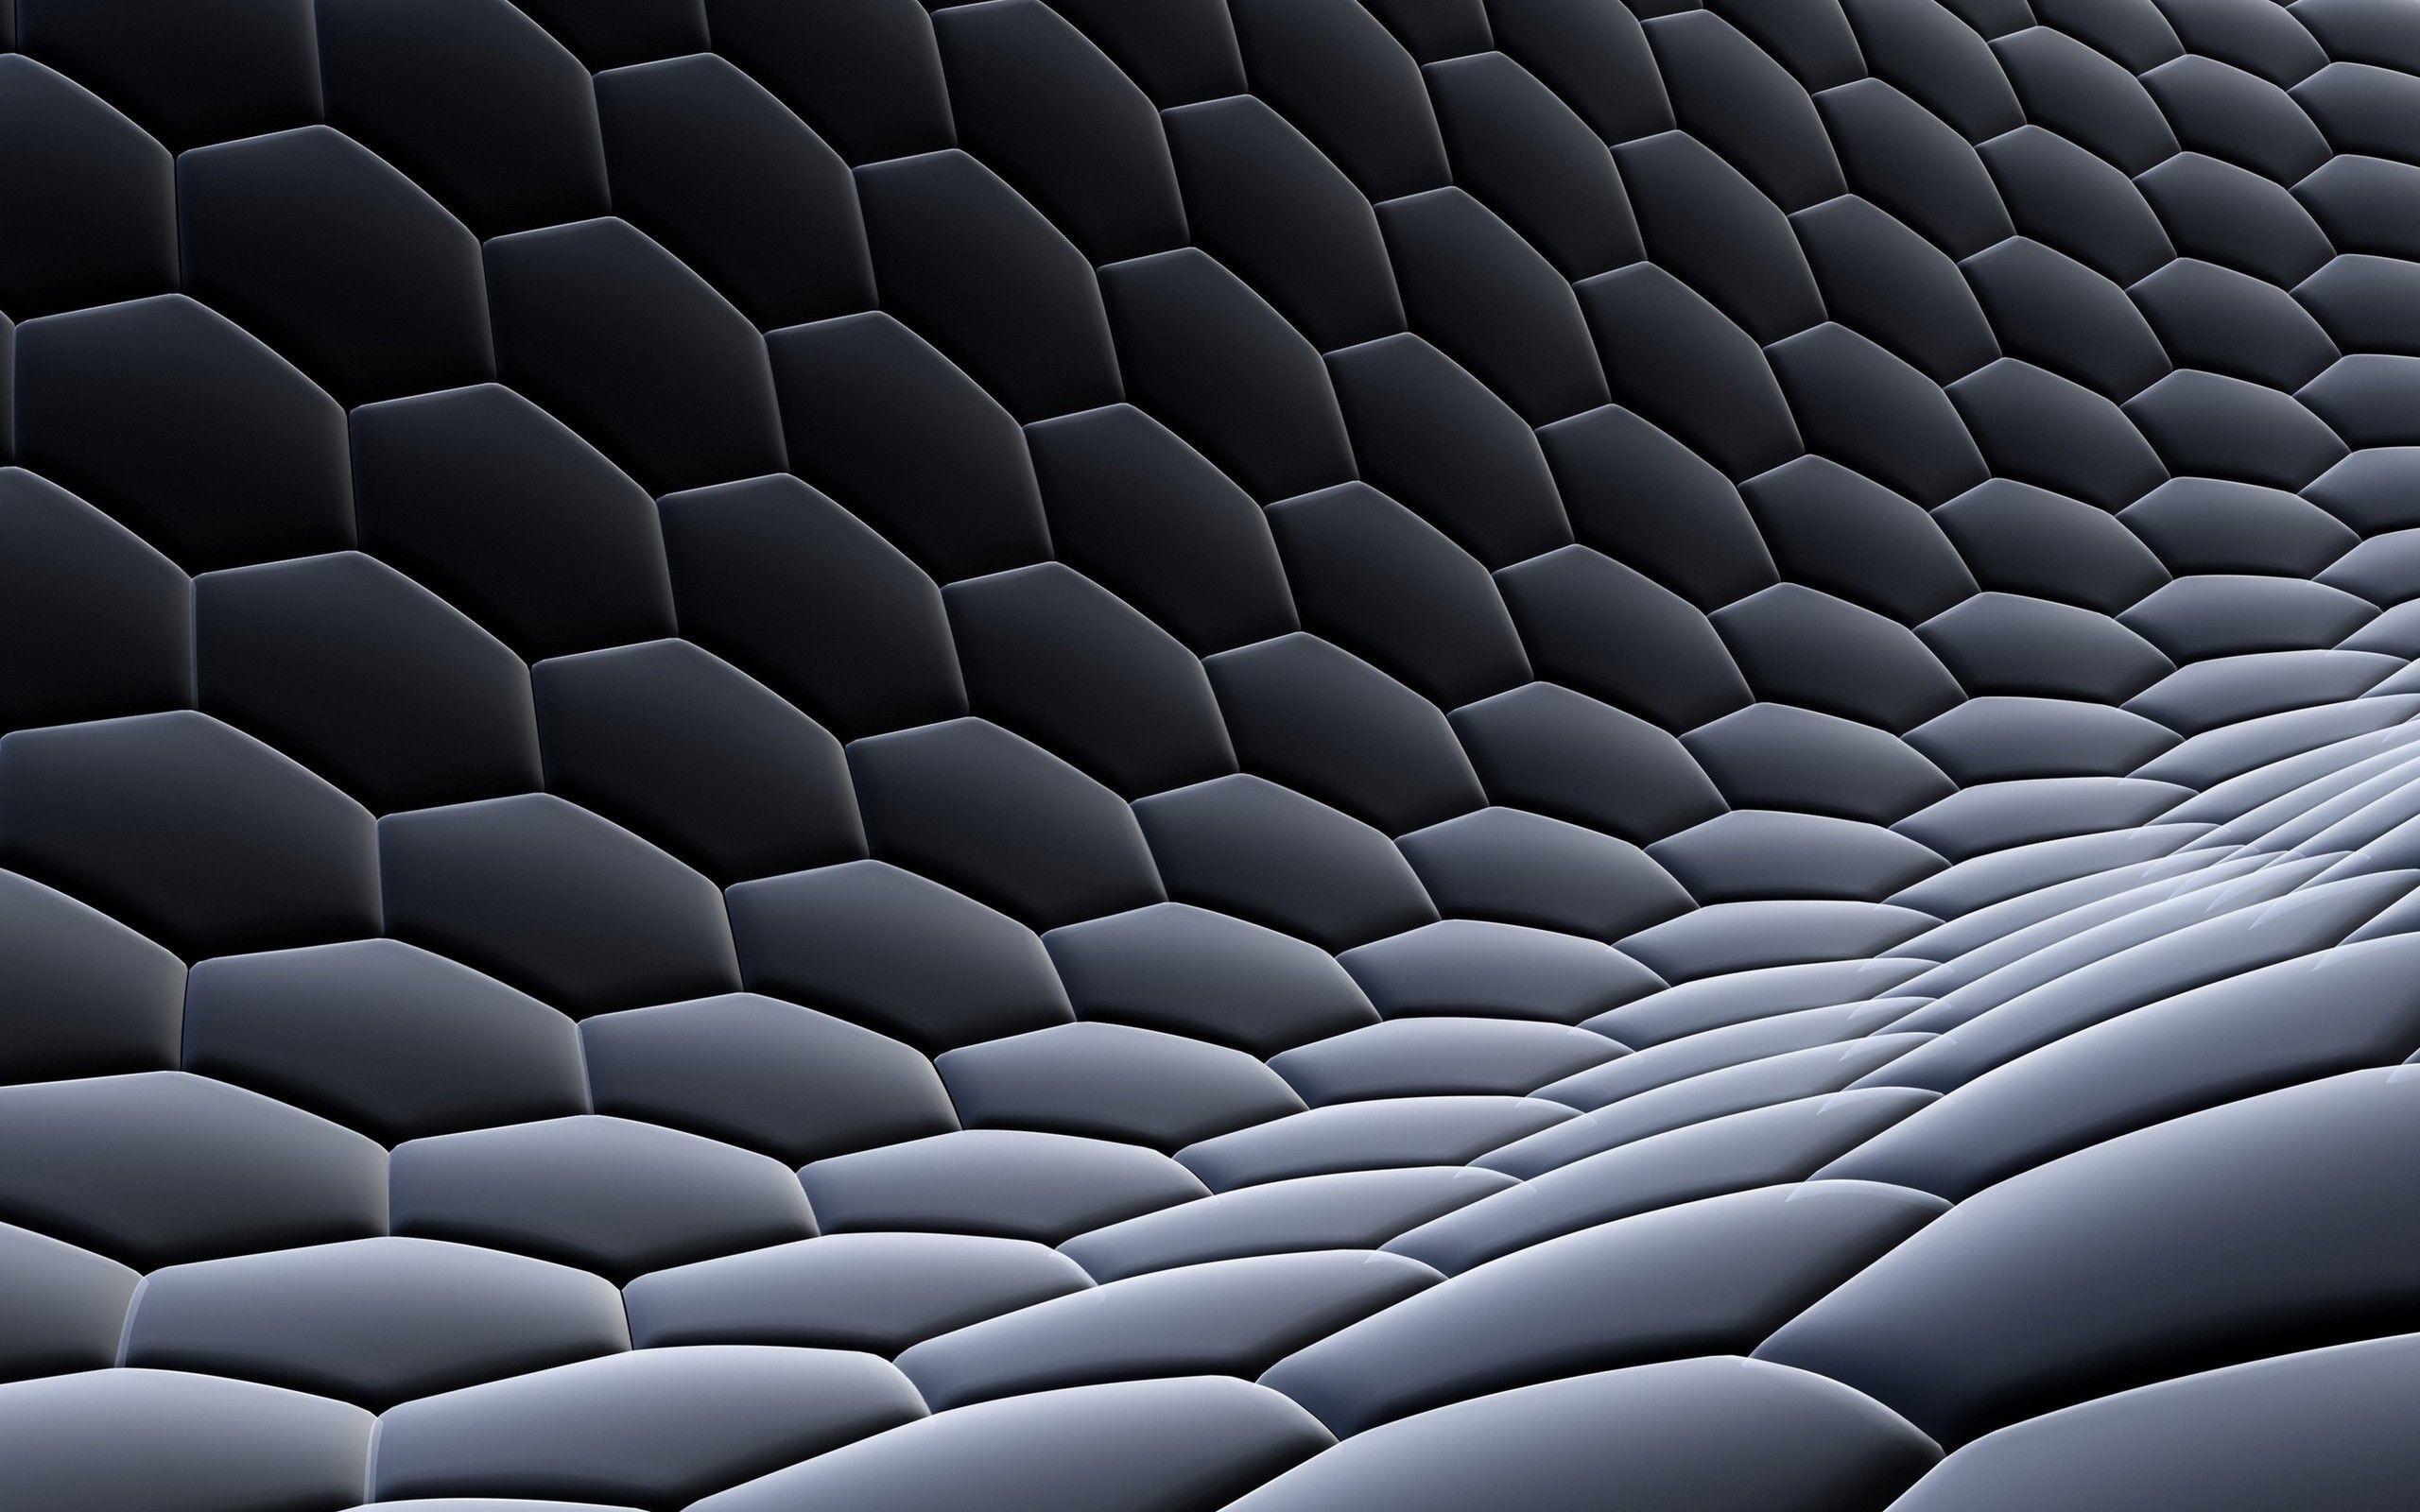 … backgrounds for black hexigon 3d camo background www …